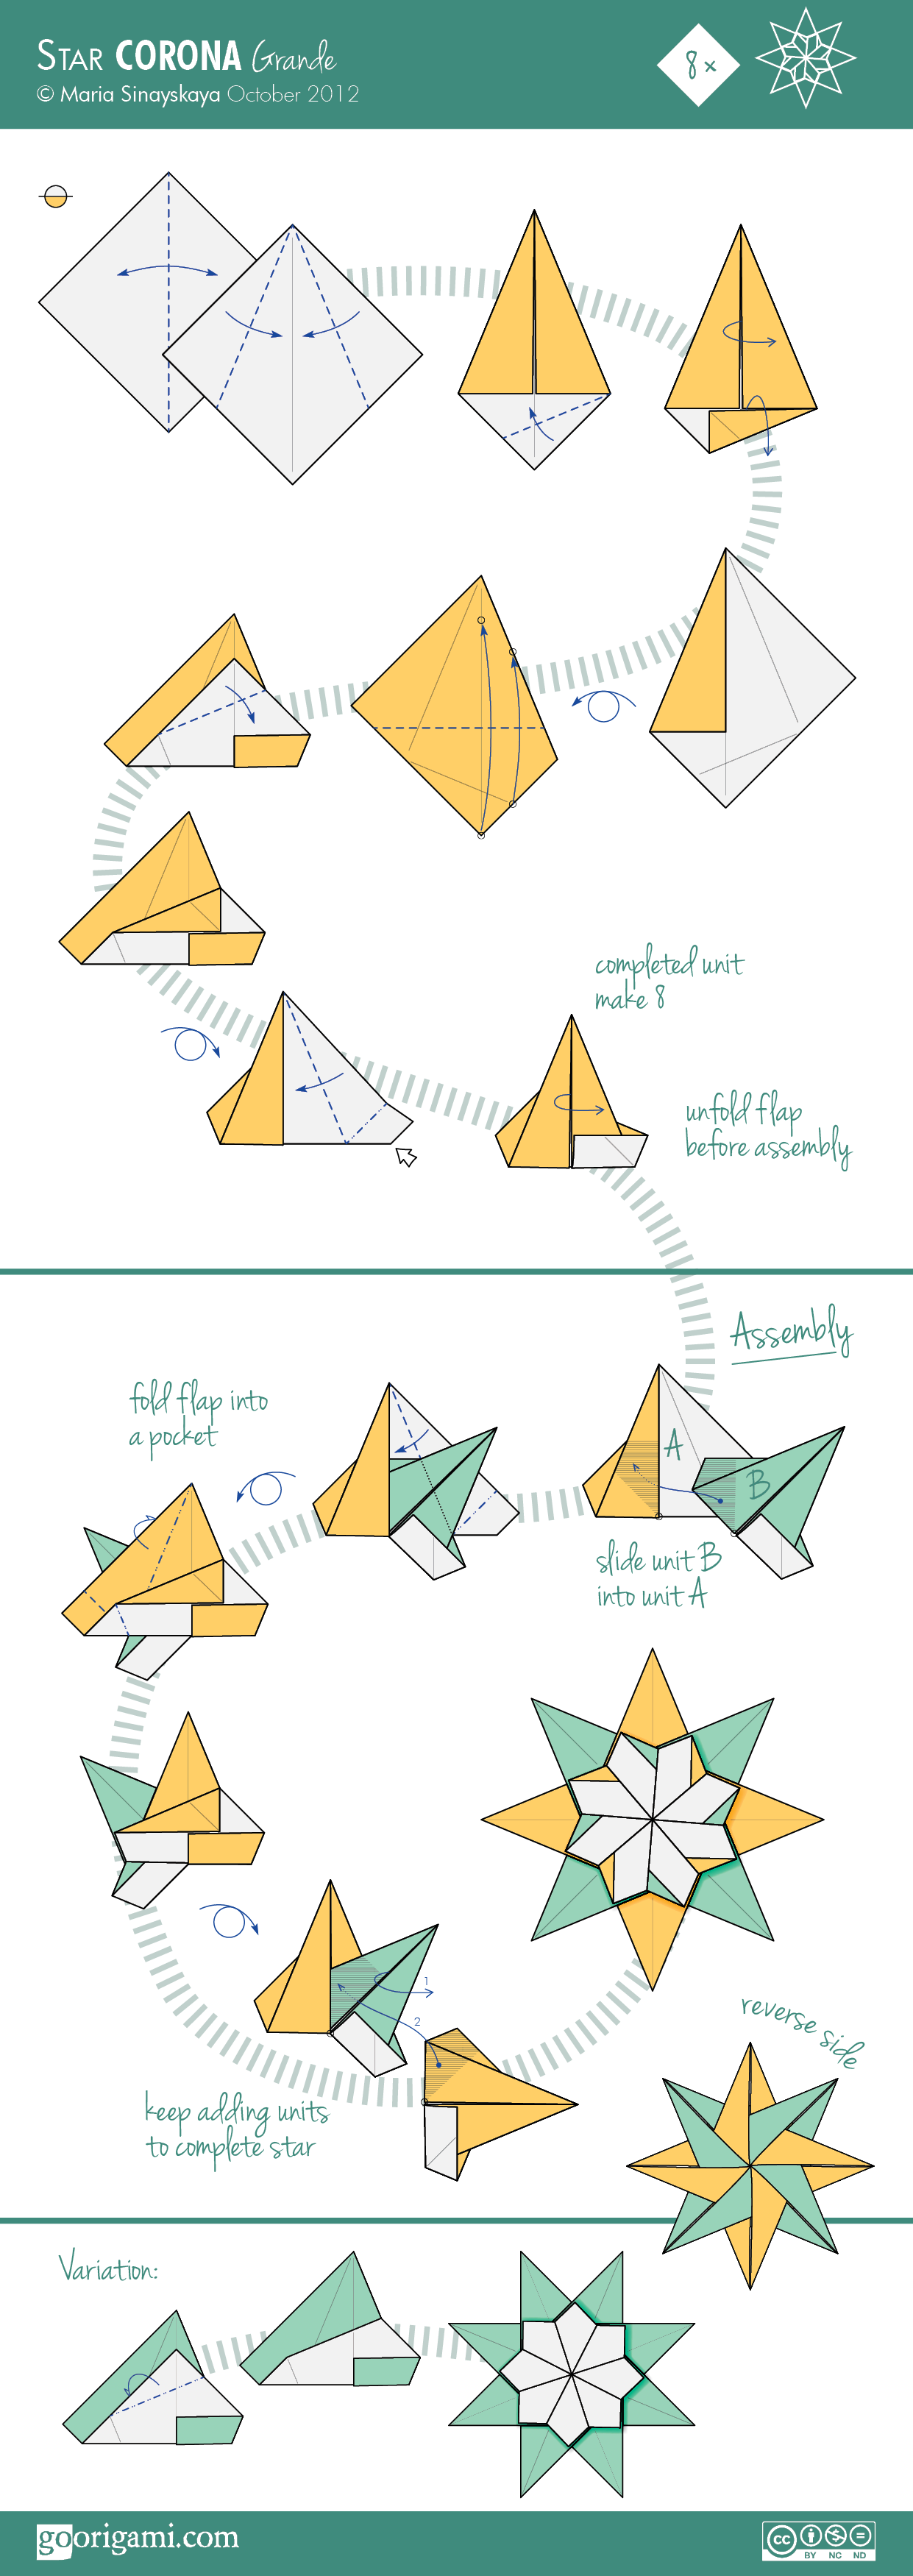 Star Corona Grande Diagram Easy To Follow Origami Directions Ratrat Origamiorigami Rat Guide